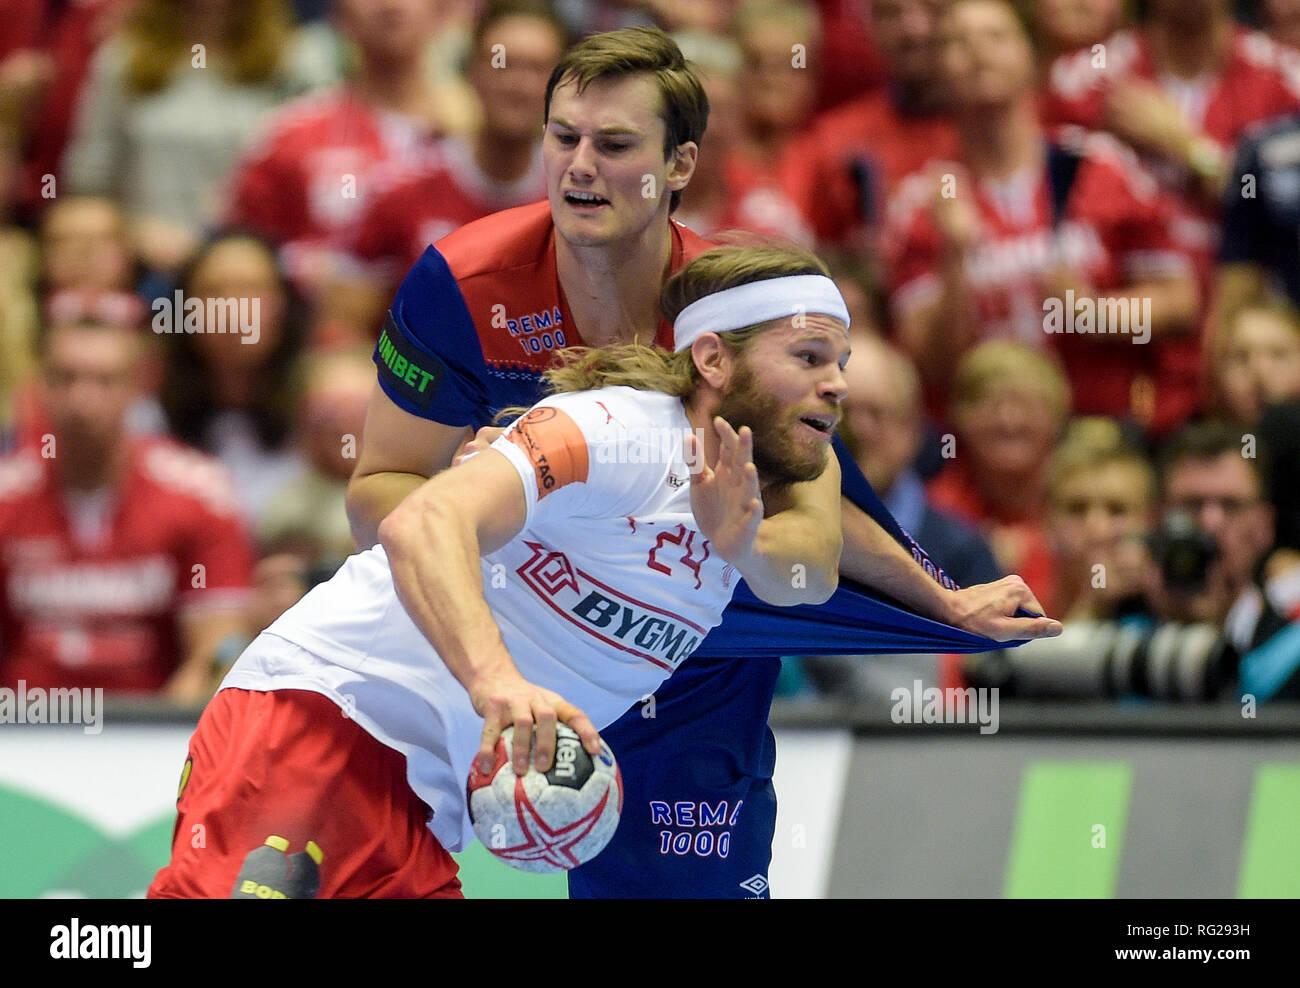 55476a10b Herning, Denmark. 27th Jan, 2019. Handball: WM, final round, final ...